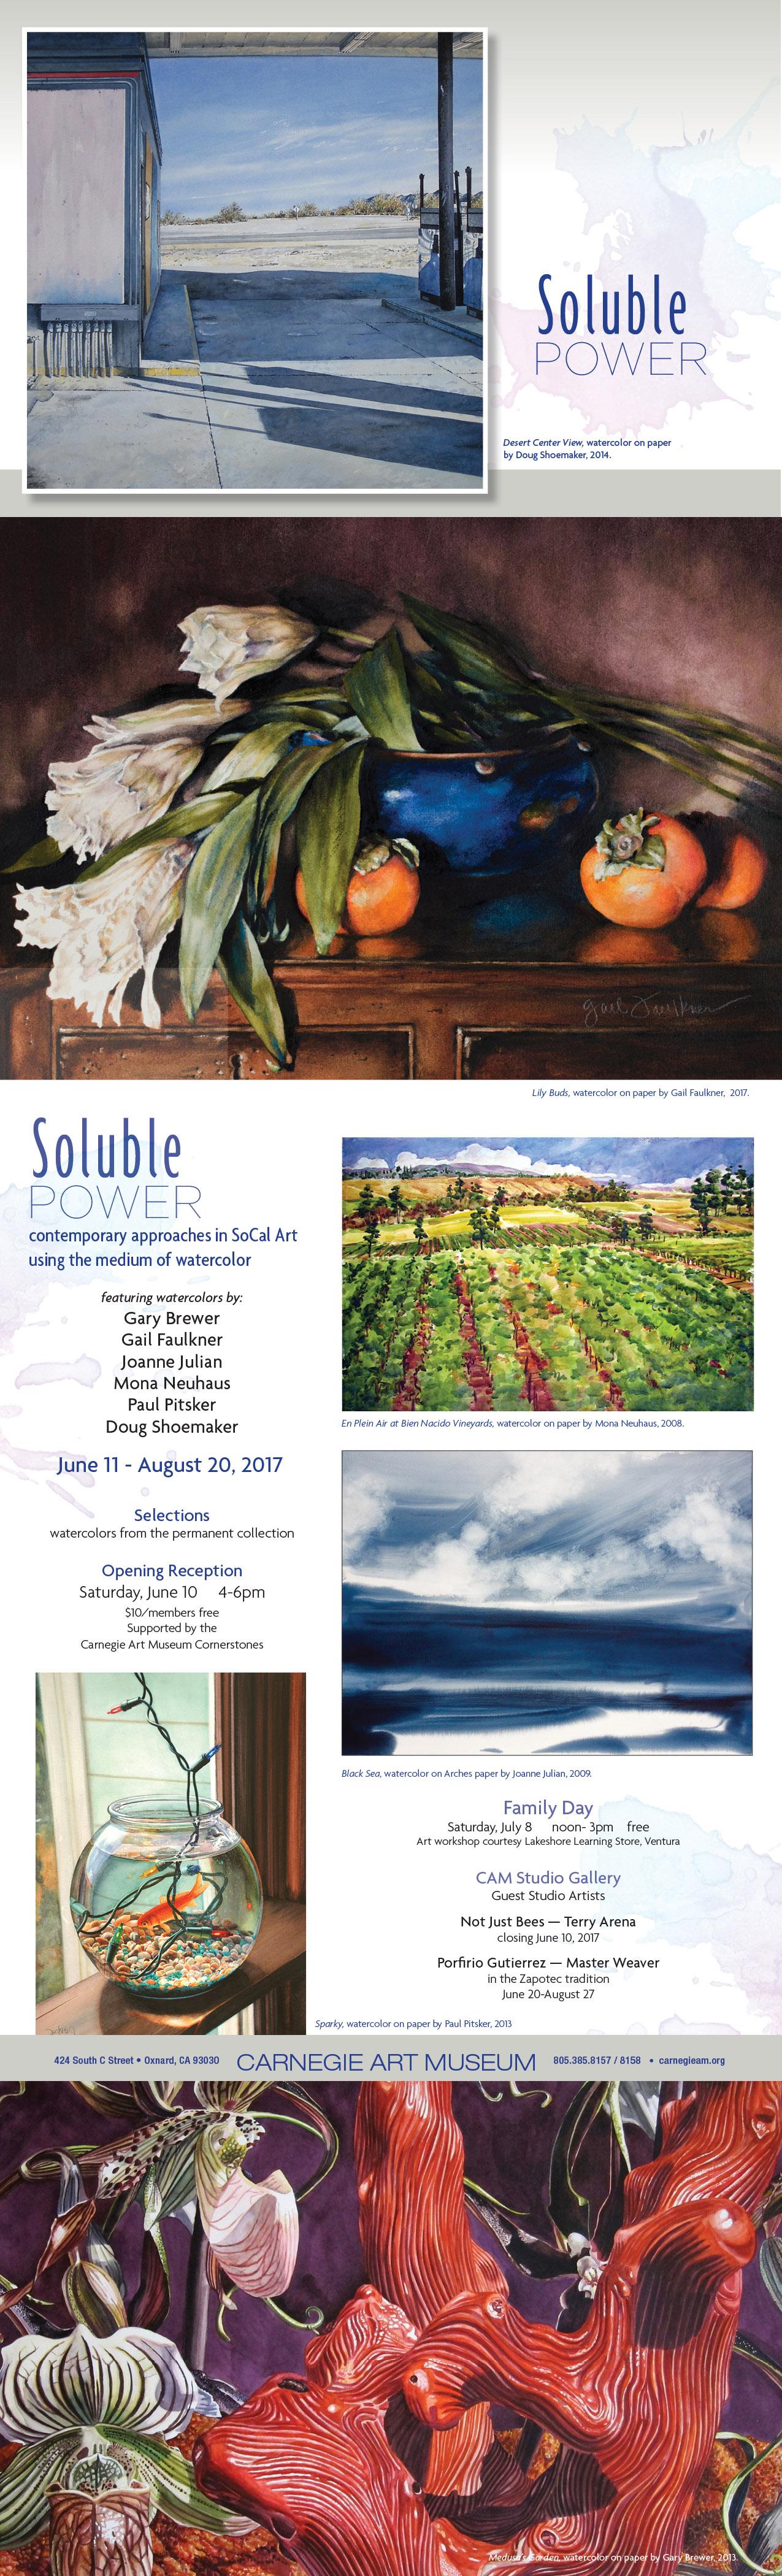 Through Aug. 20 — Carnegie Art Museum Announces Summer Exhibition